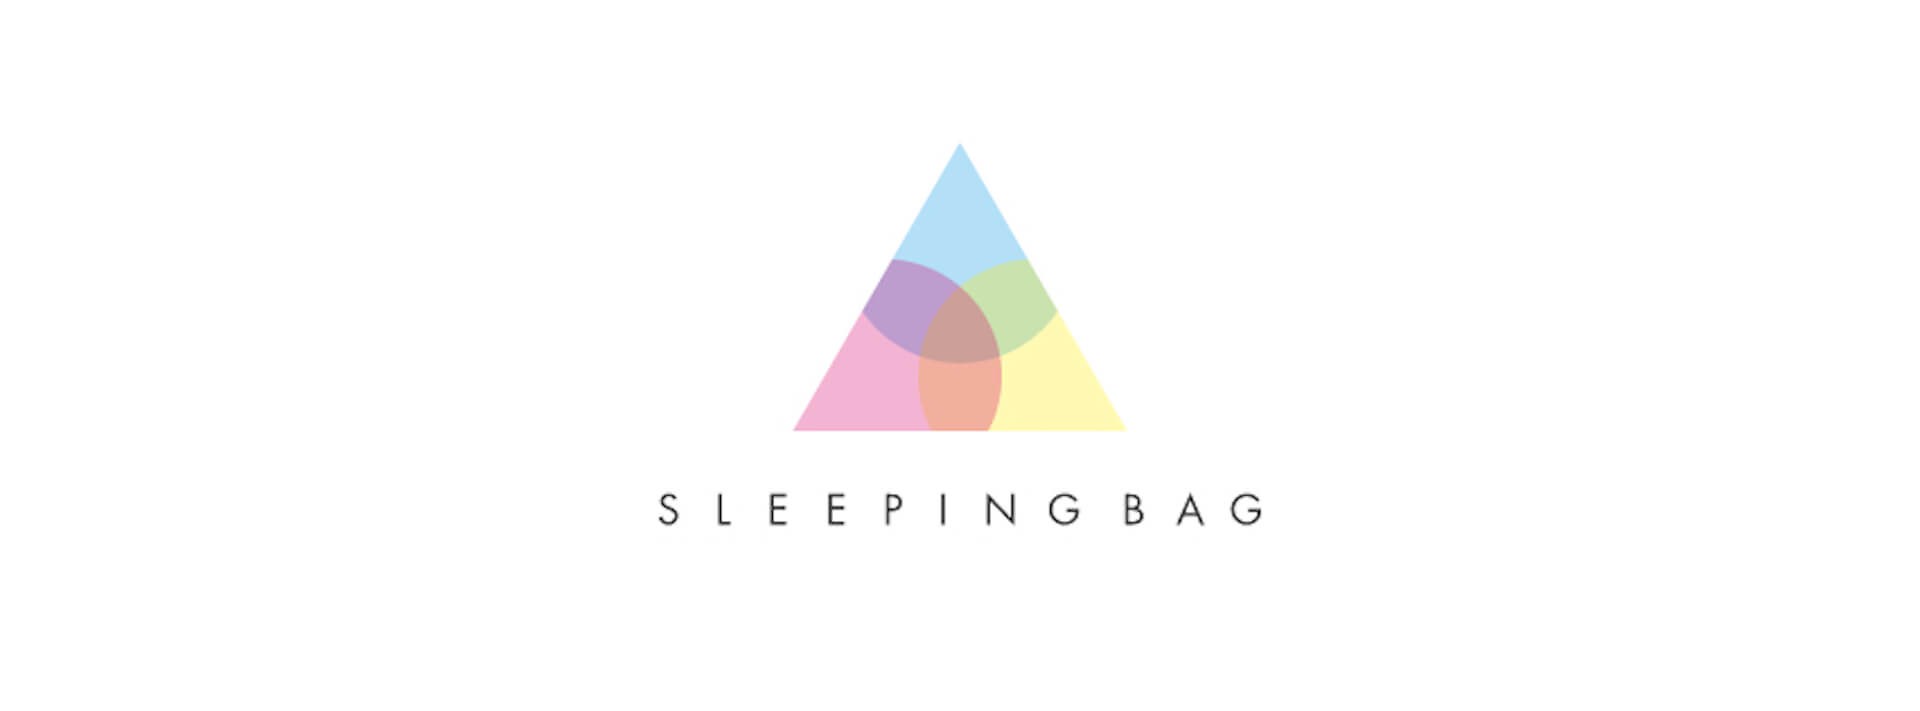 <SLEEPING BAG>座談会|オープン10周年を前にそれぞれが語る、イベントへの熱い想い sleeping-bag1